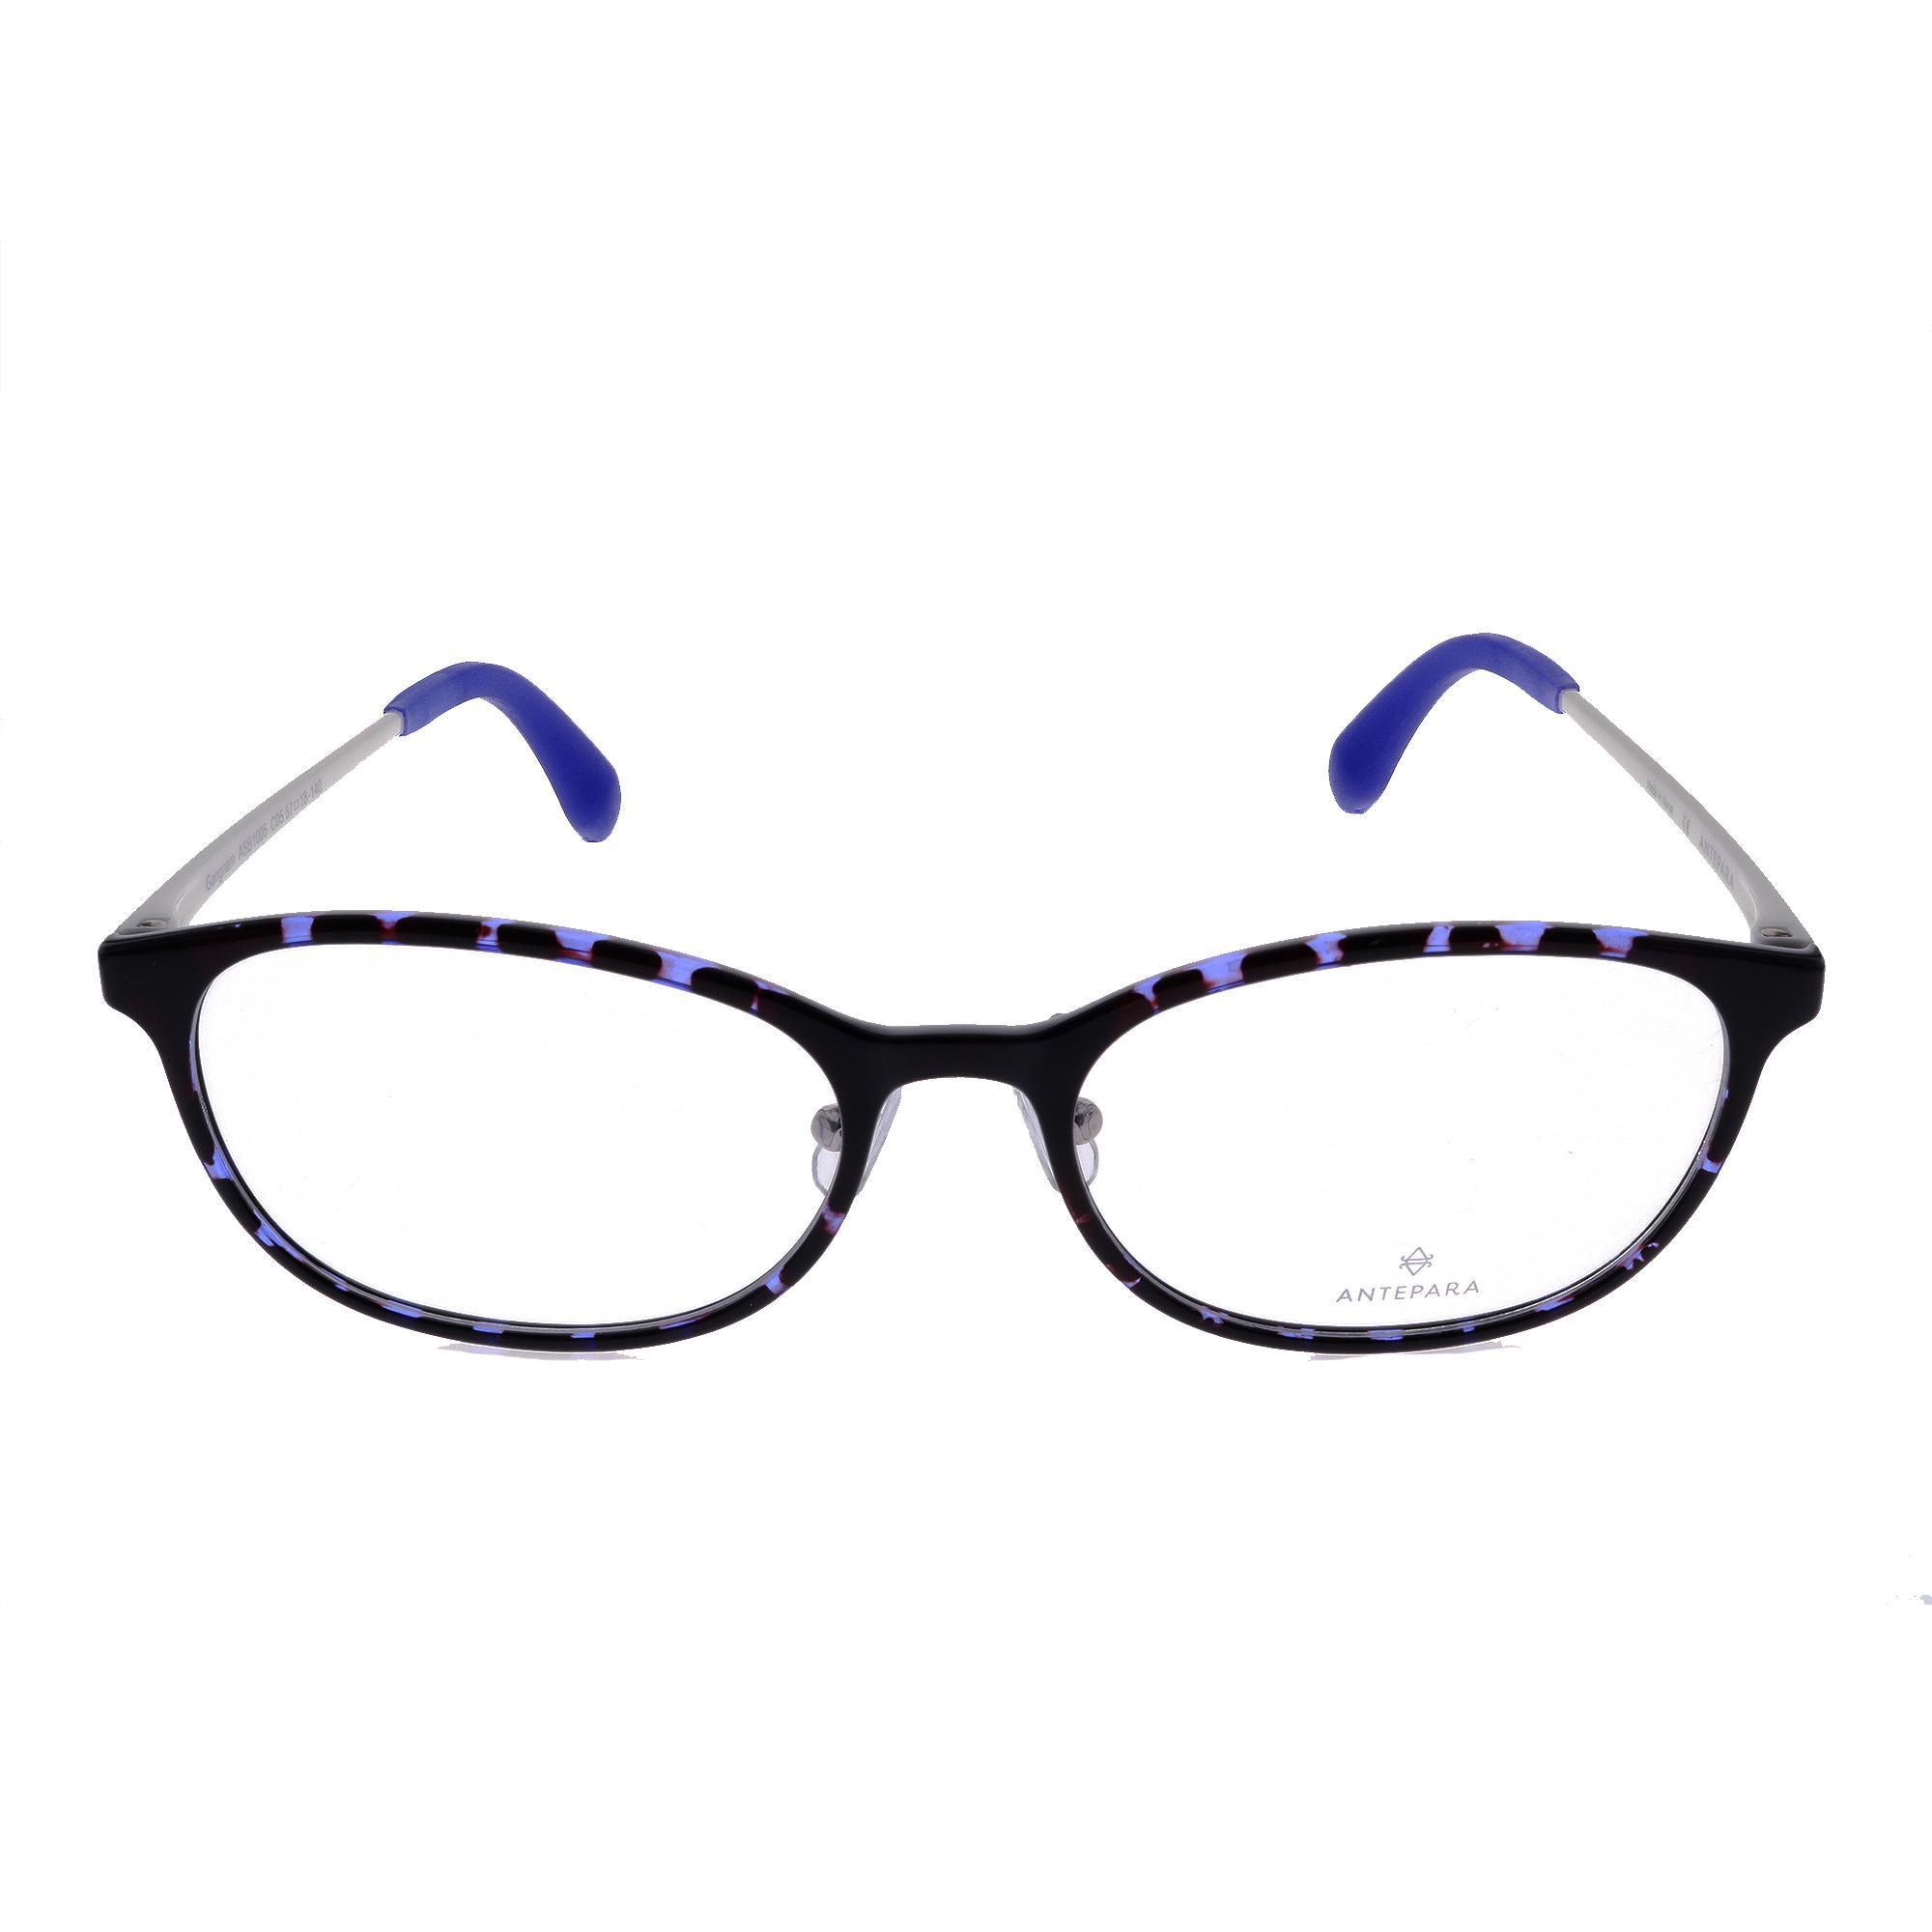 b2ba24dba0a Philippines. Gangnam ASB1005 C05 Eyeglasses Tortoise Blue Frame Clear Lens  (57-18-140)